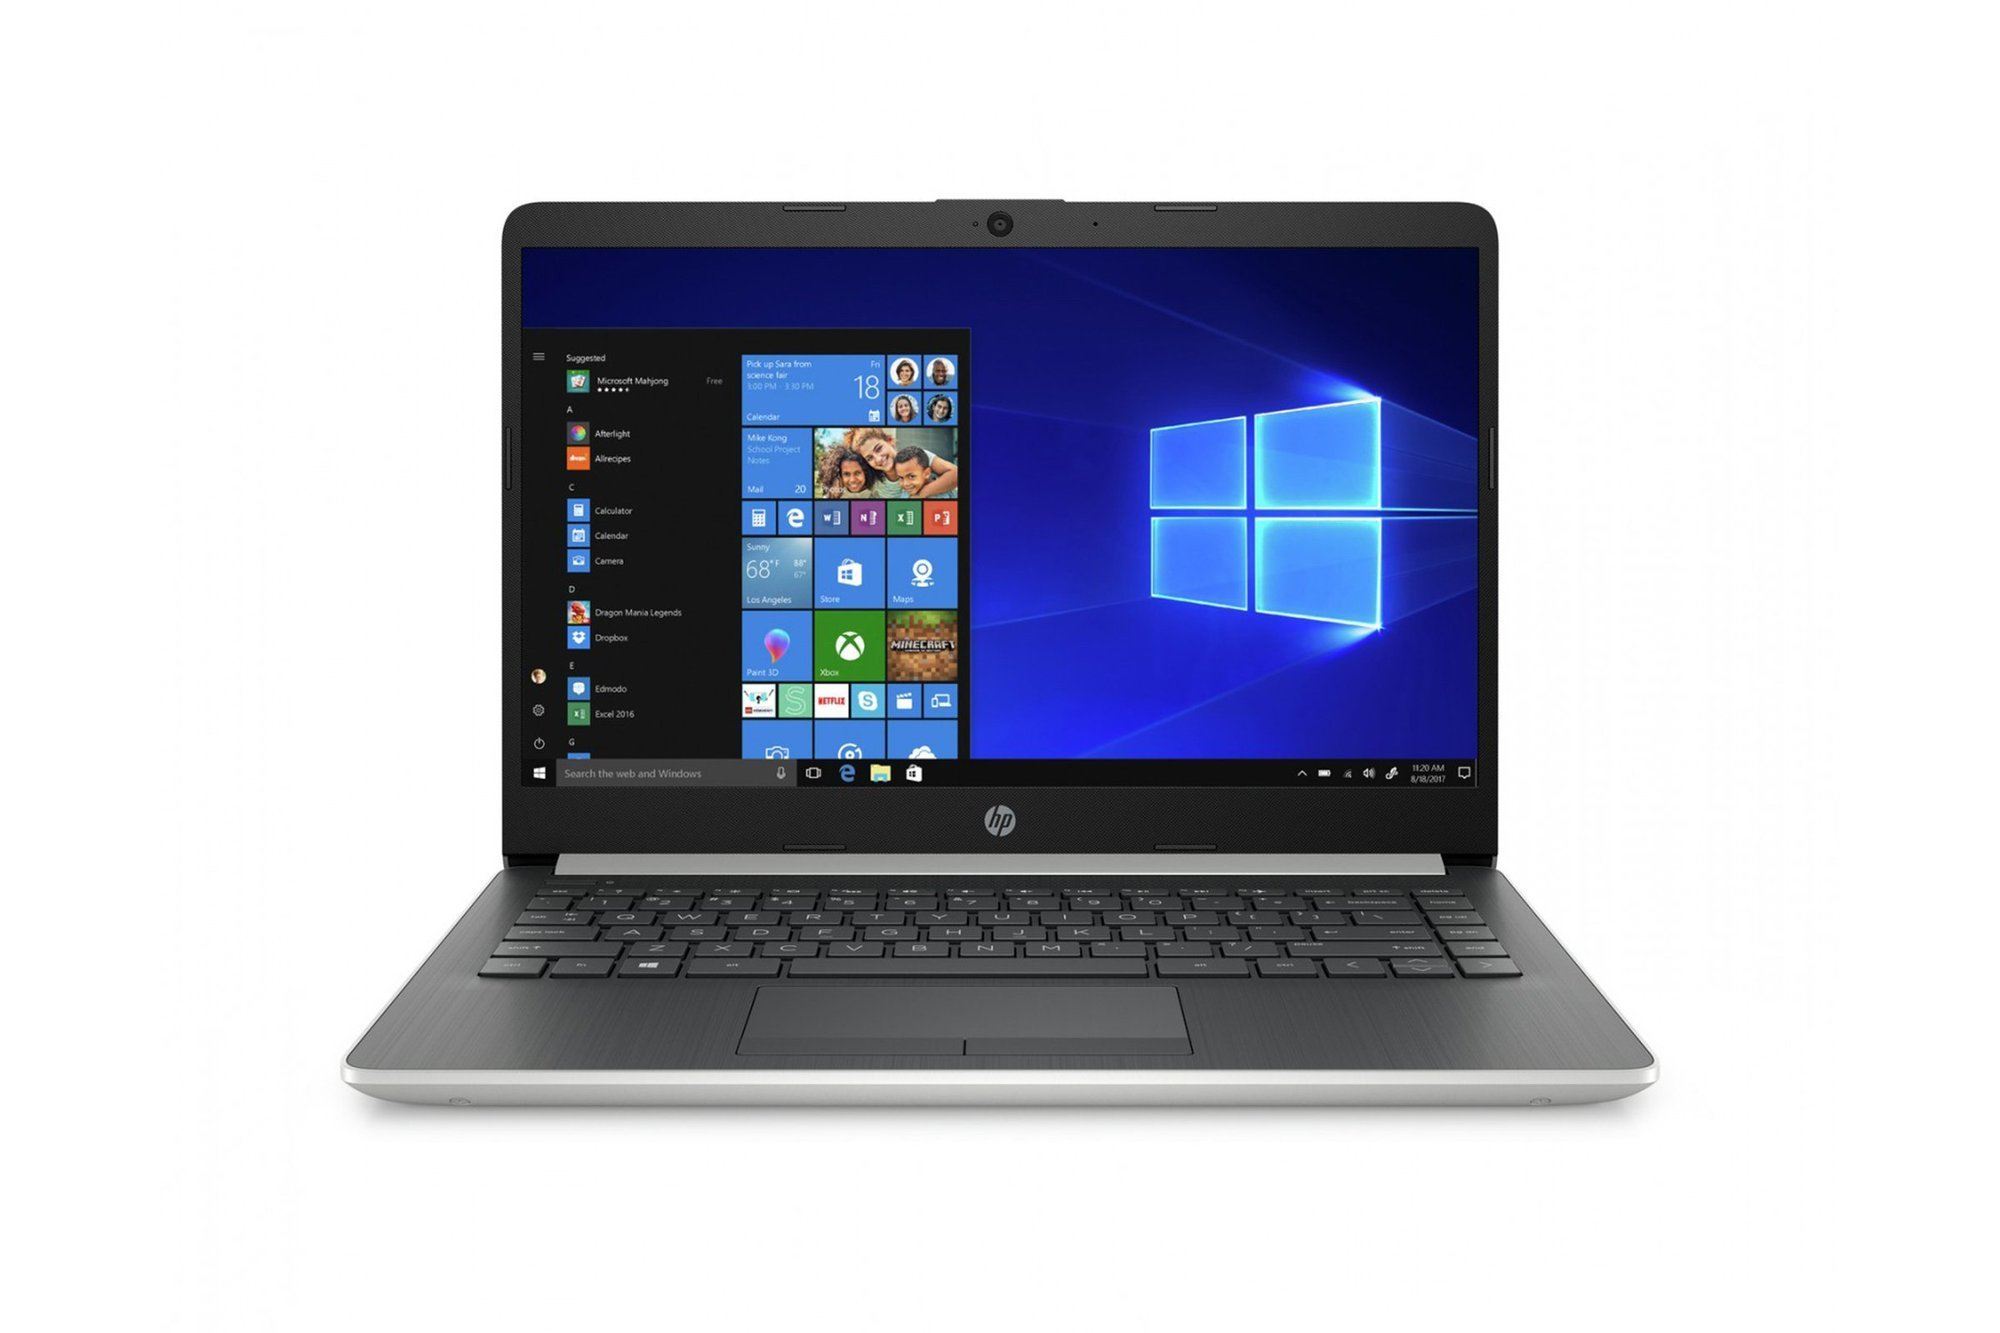 Notebook HP 14-dk0011na 14 FHD 8GB 256GB SSD Win10 AMD Ryzen 5 3500U